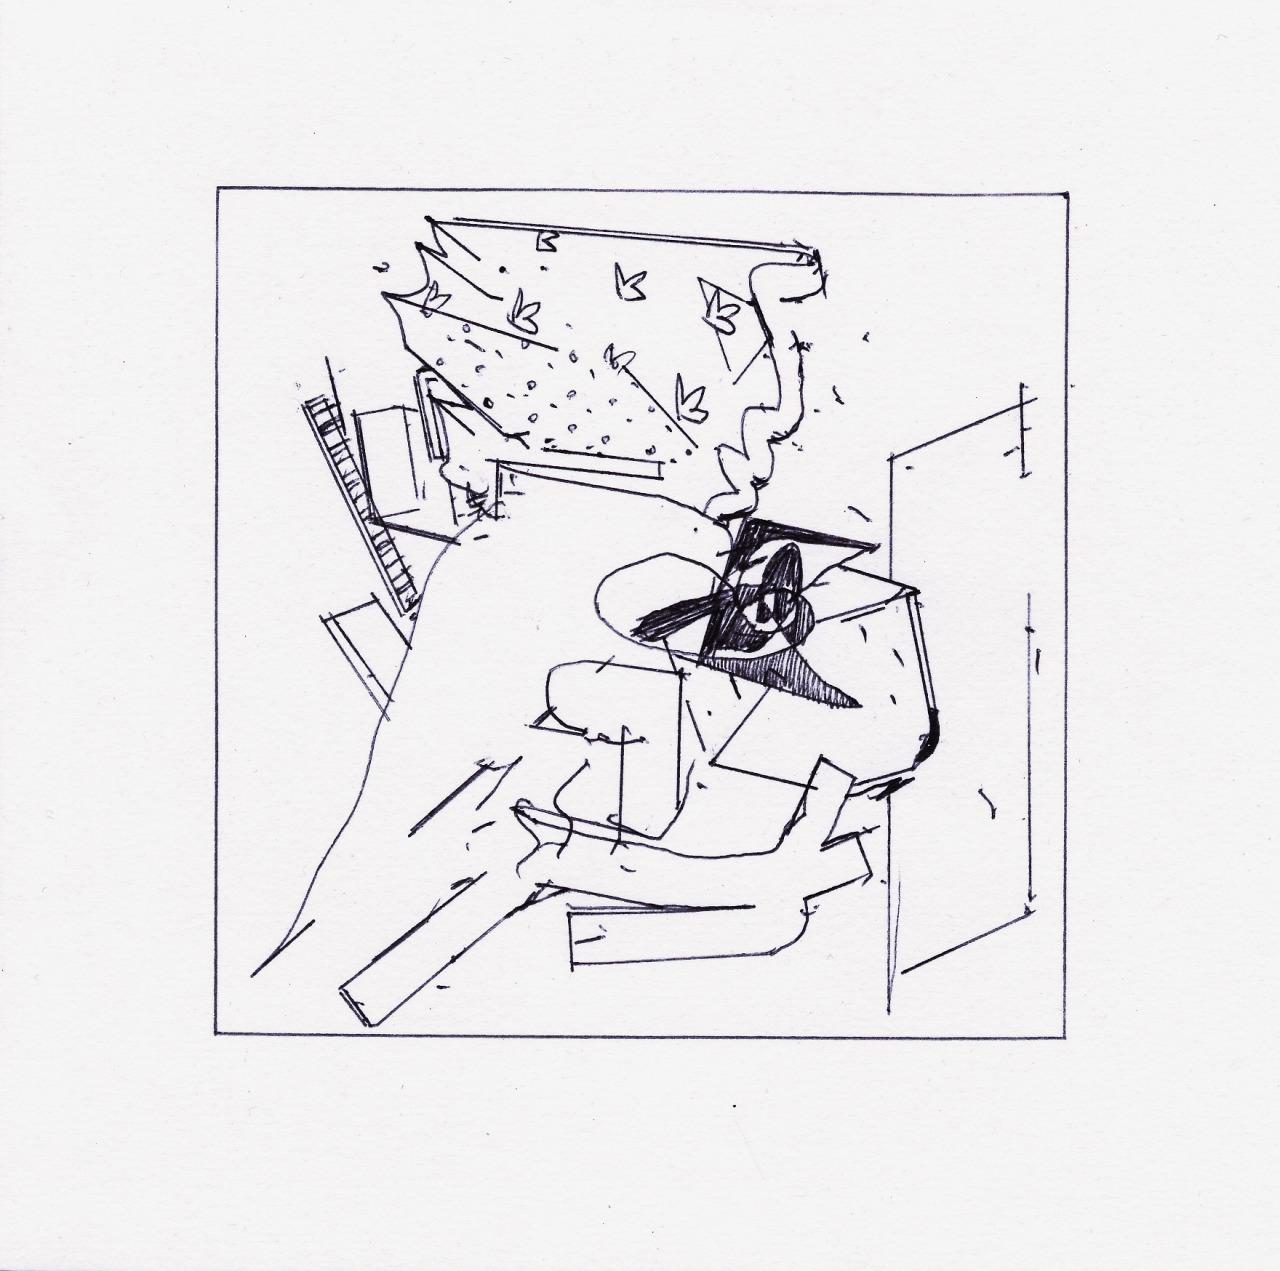 Raw Hands 2021 Ballpoint pen on paper 15 x 15 cm  https://ift.tt/39Yjnoh #drawing#small#square#ballpointpen#line